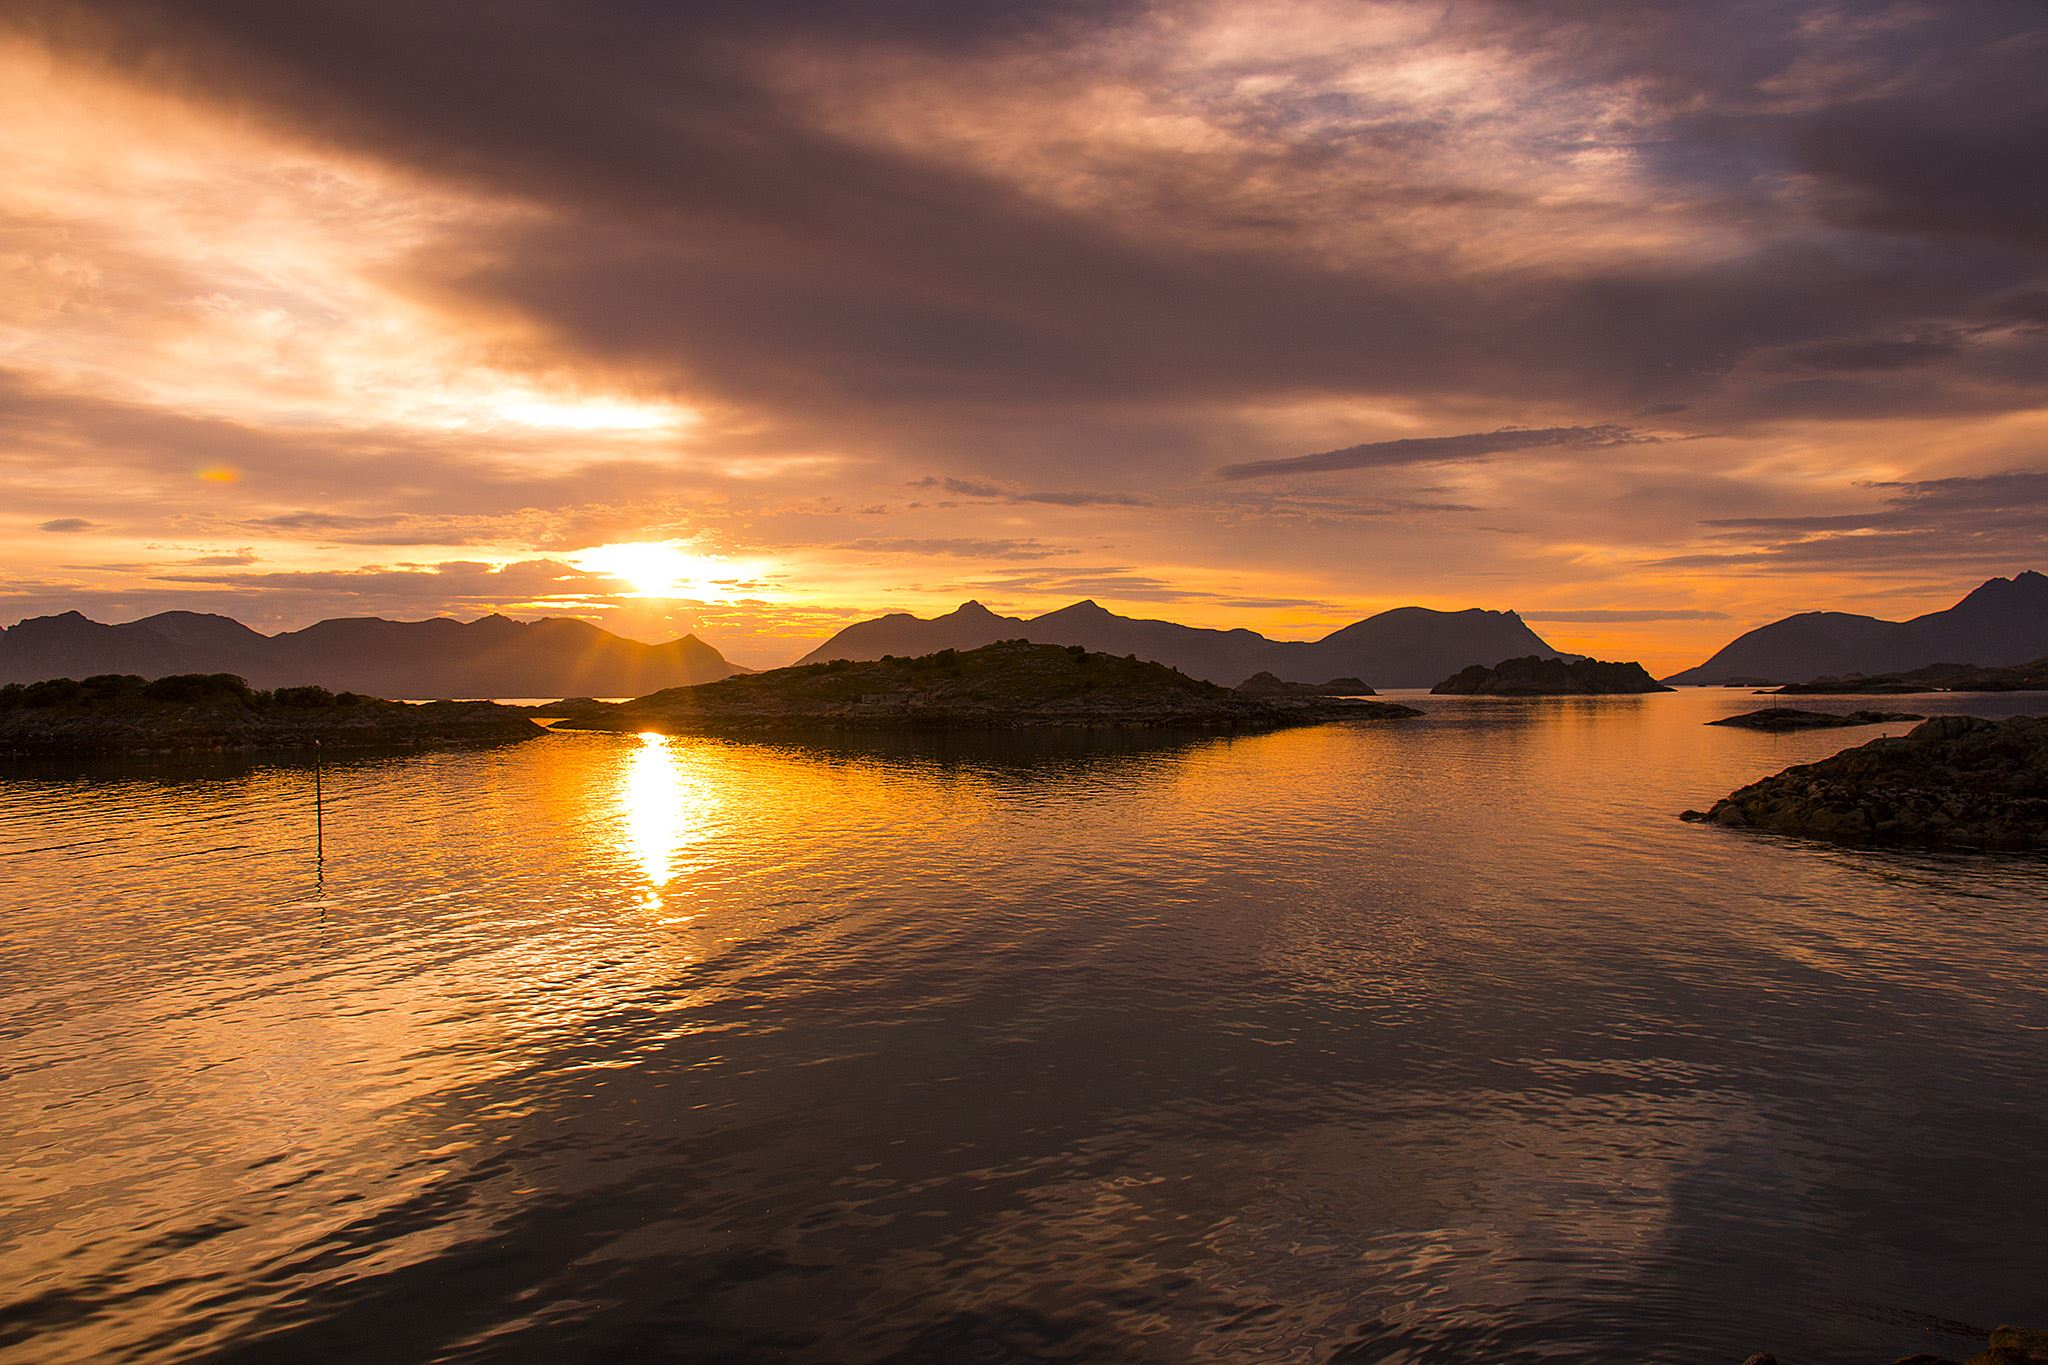 Seil Norge,  © Seil Norge, SeilNorge